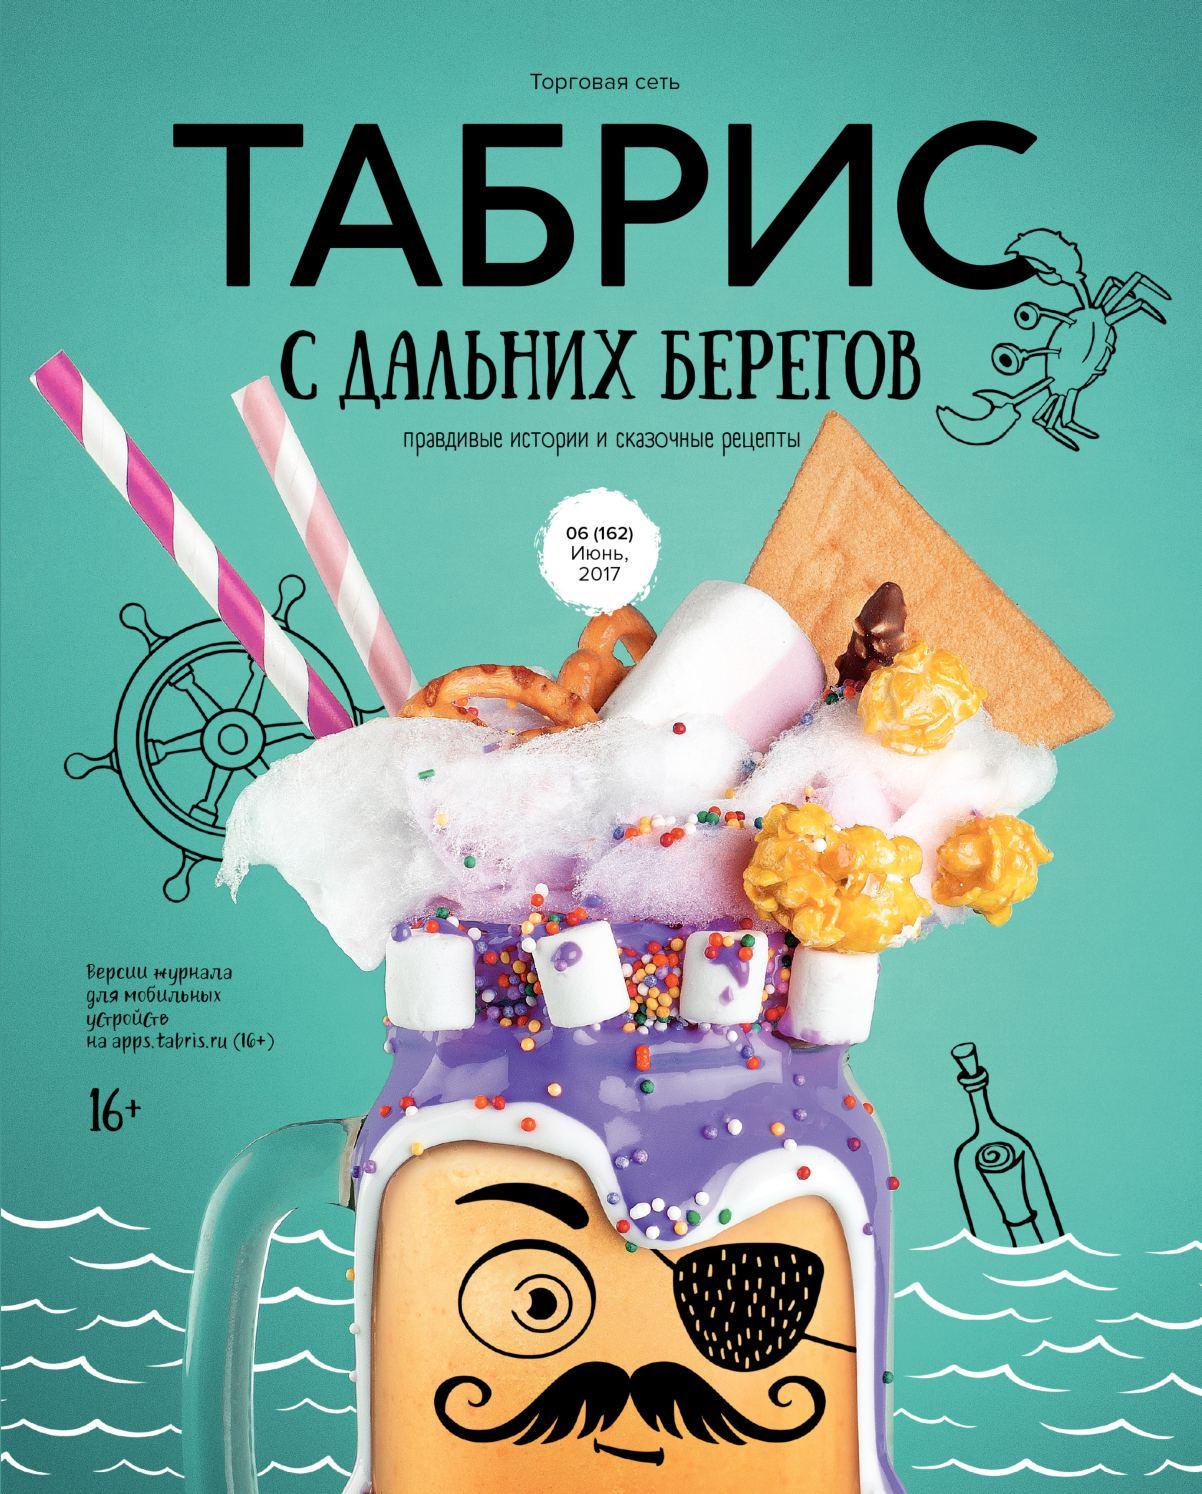 Табрис №162 (Июнь 2017)